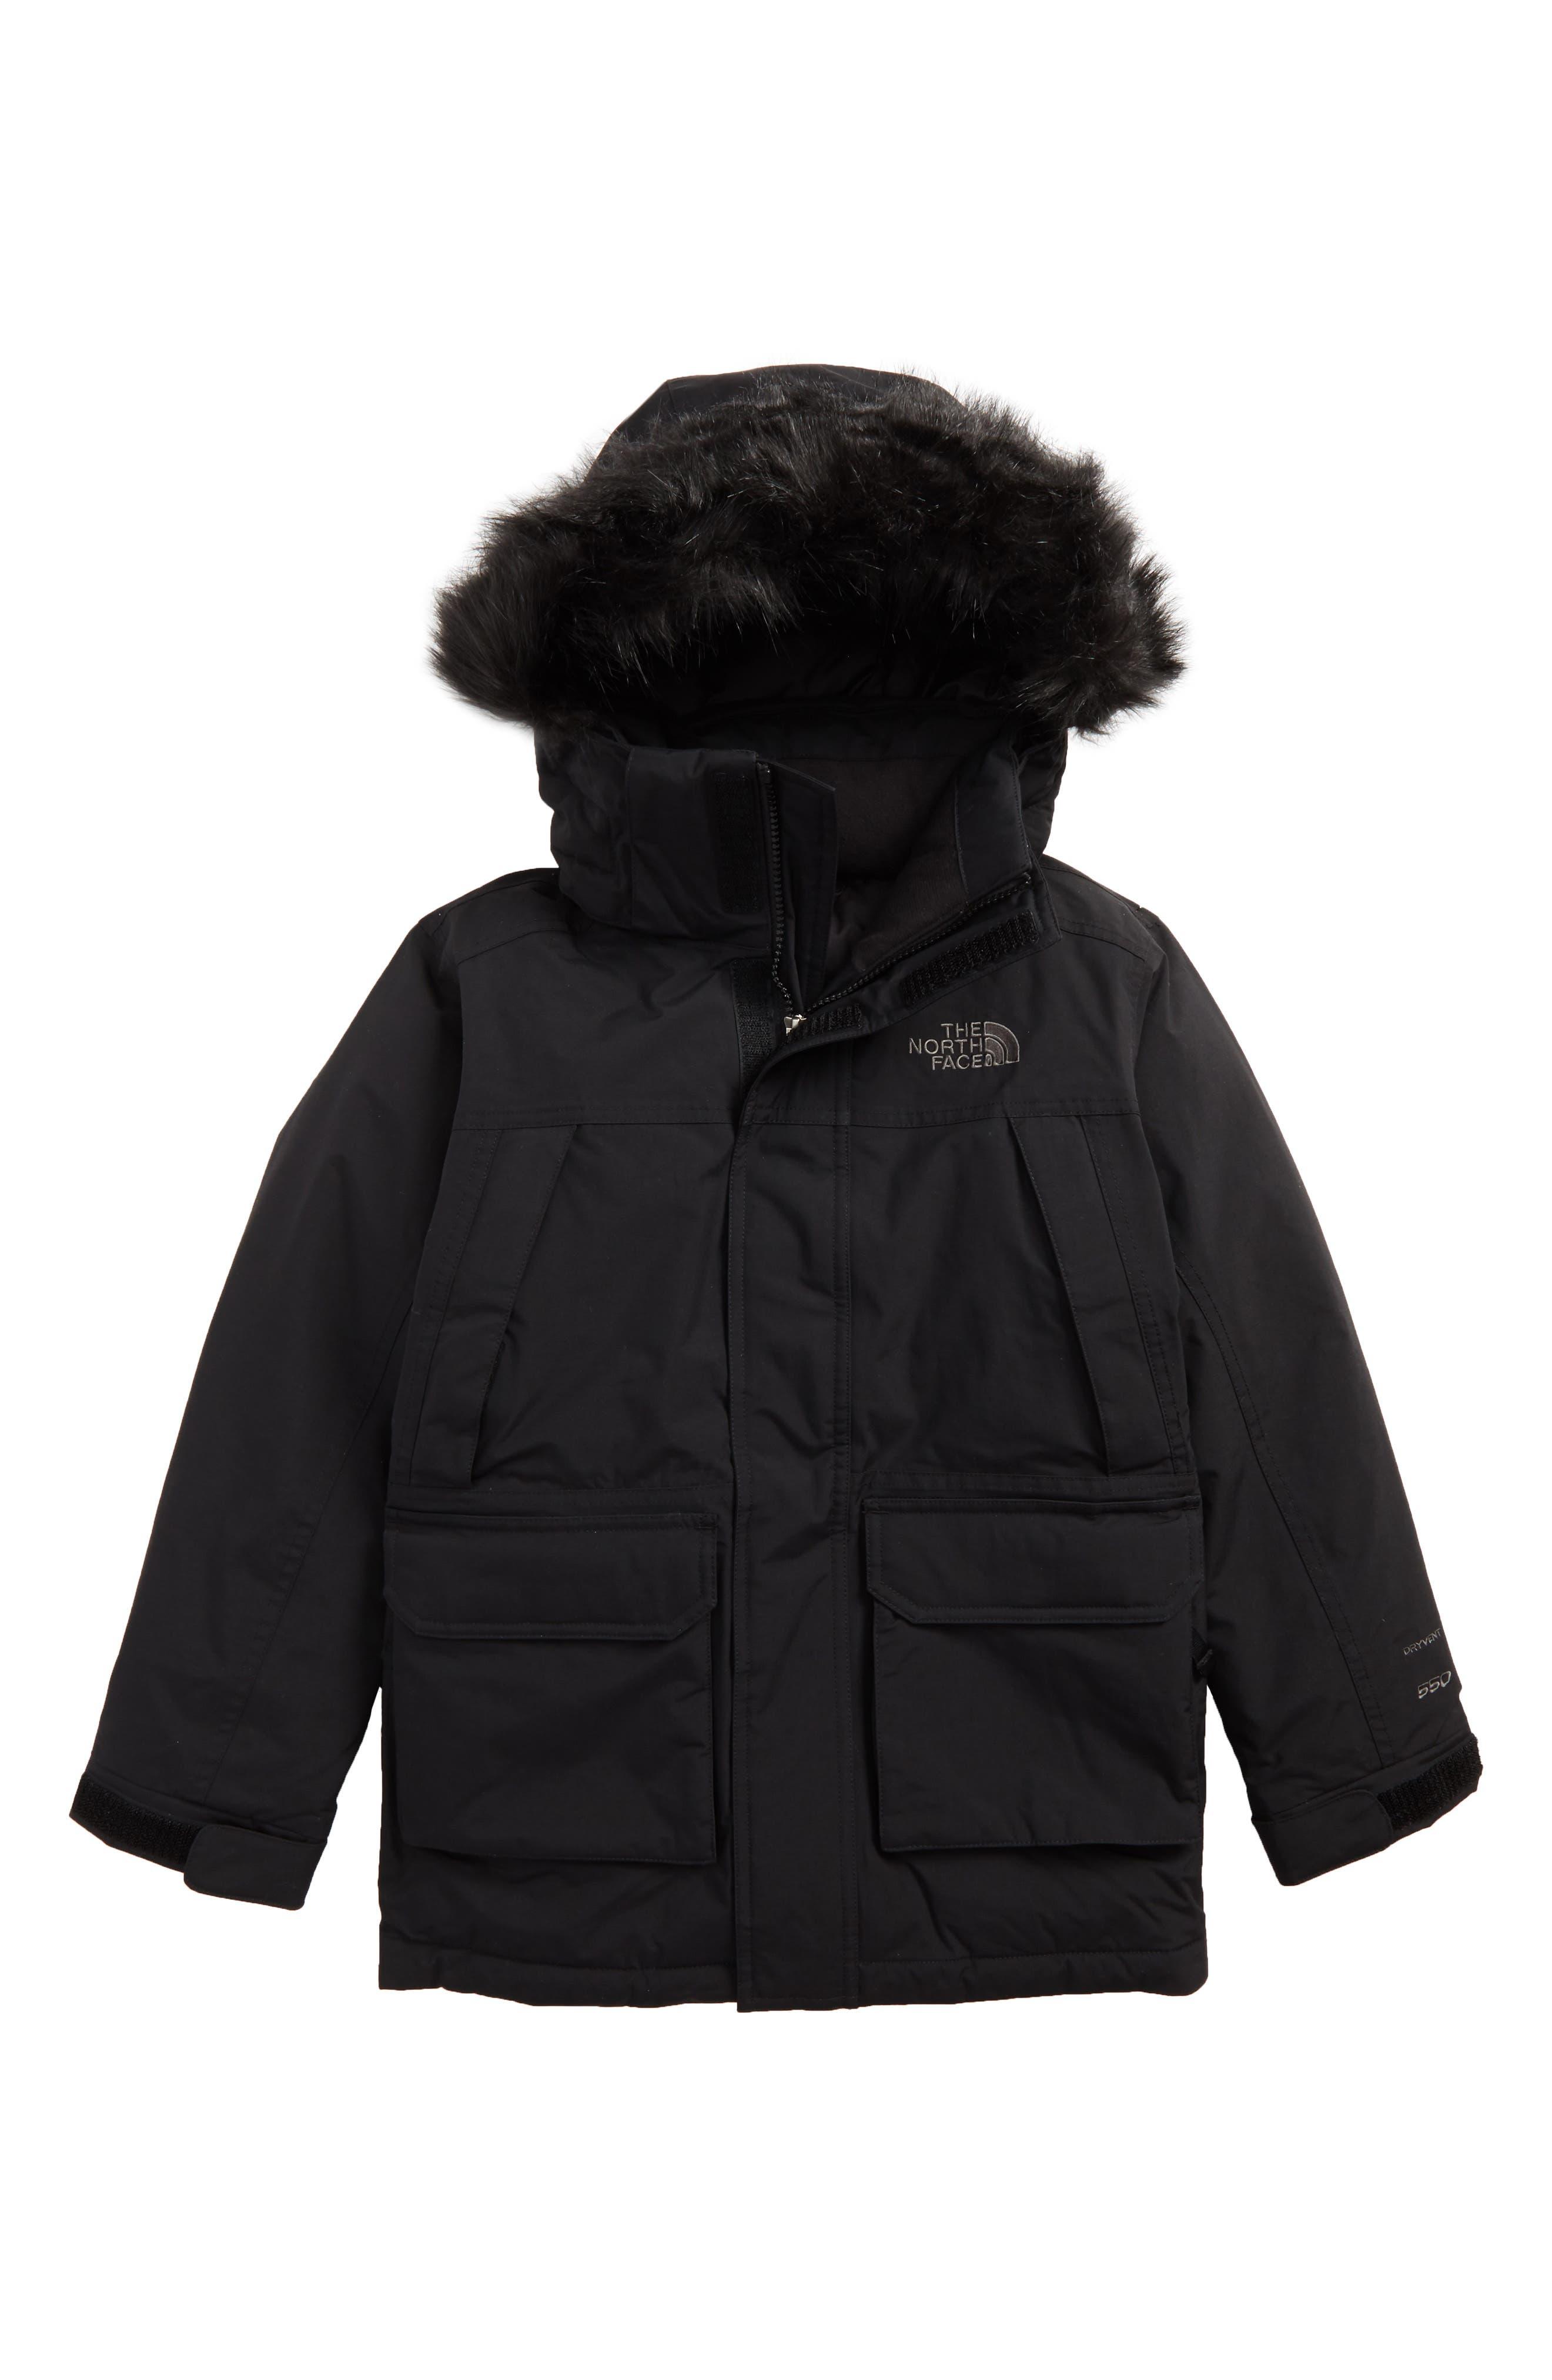 McMurdo Waterproof Down Parka with Faux Fur Trim,                             Main thumbnail 1, color,                             001